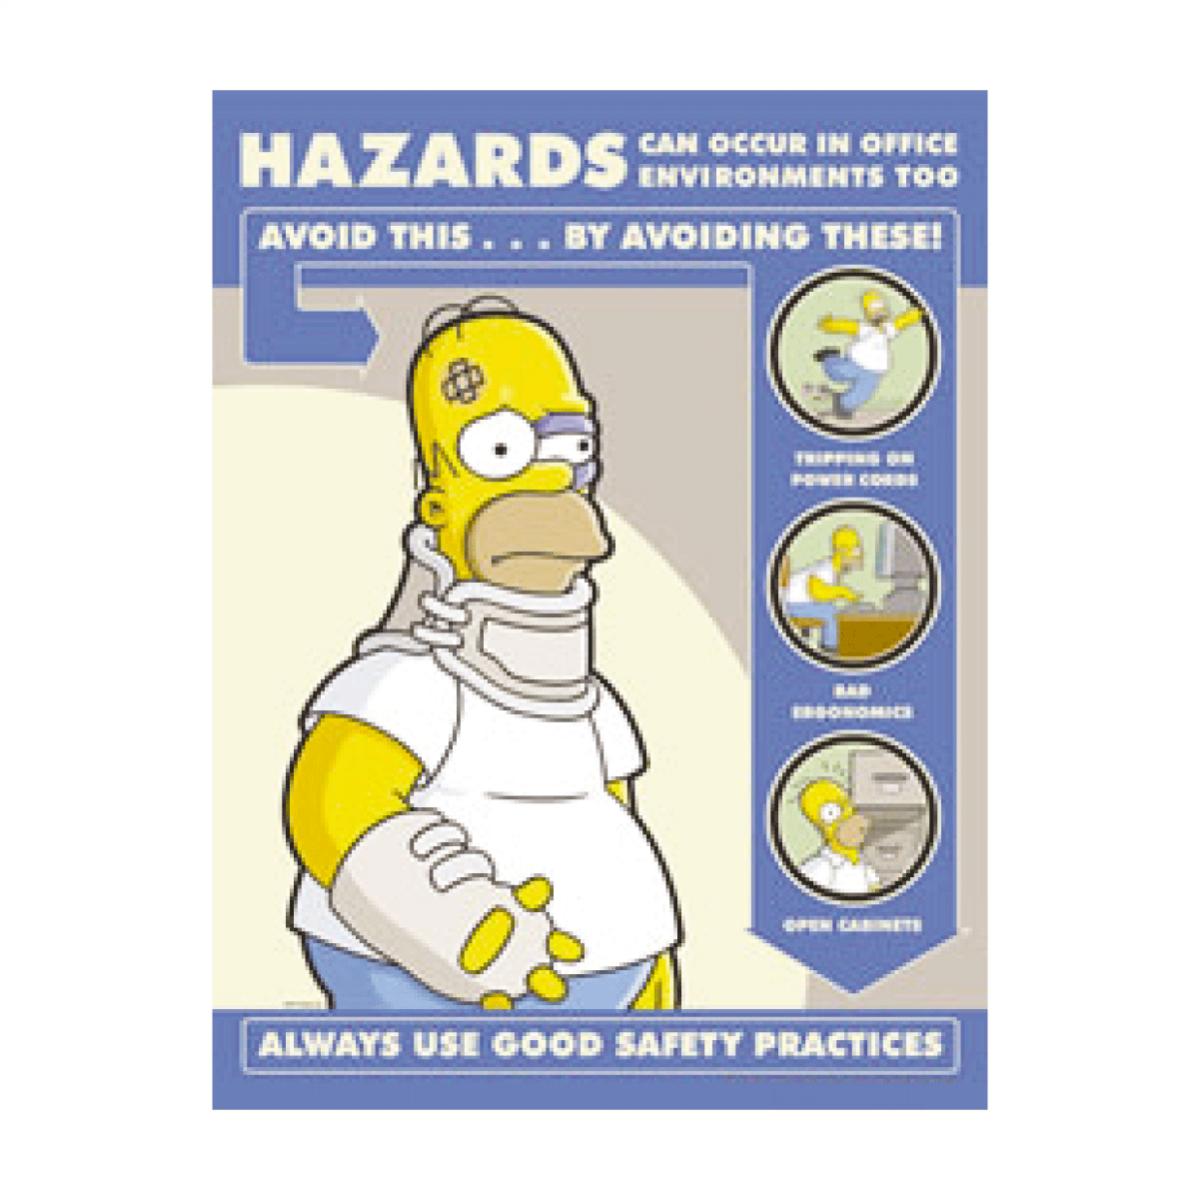 Simpsons Hazards In Office Environment